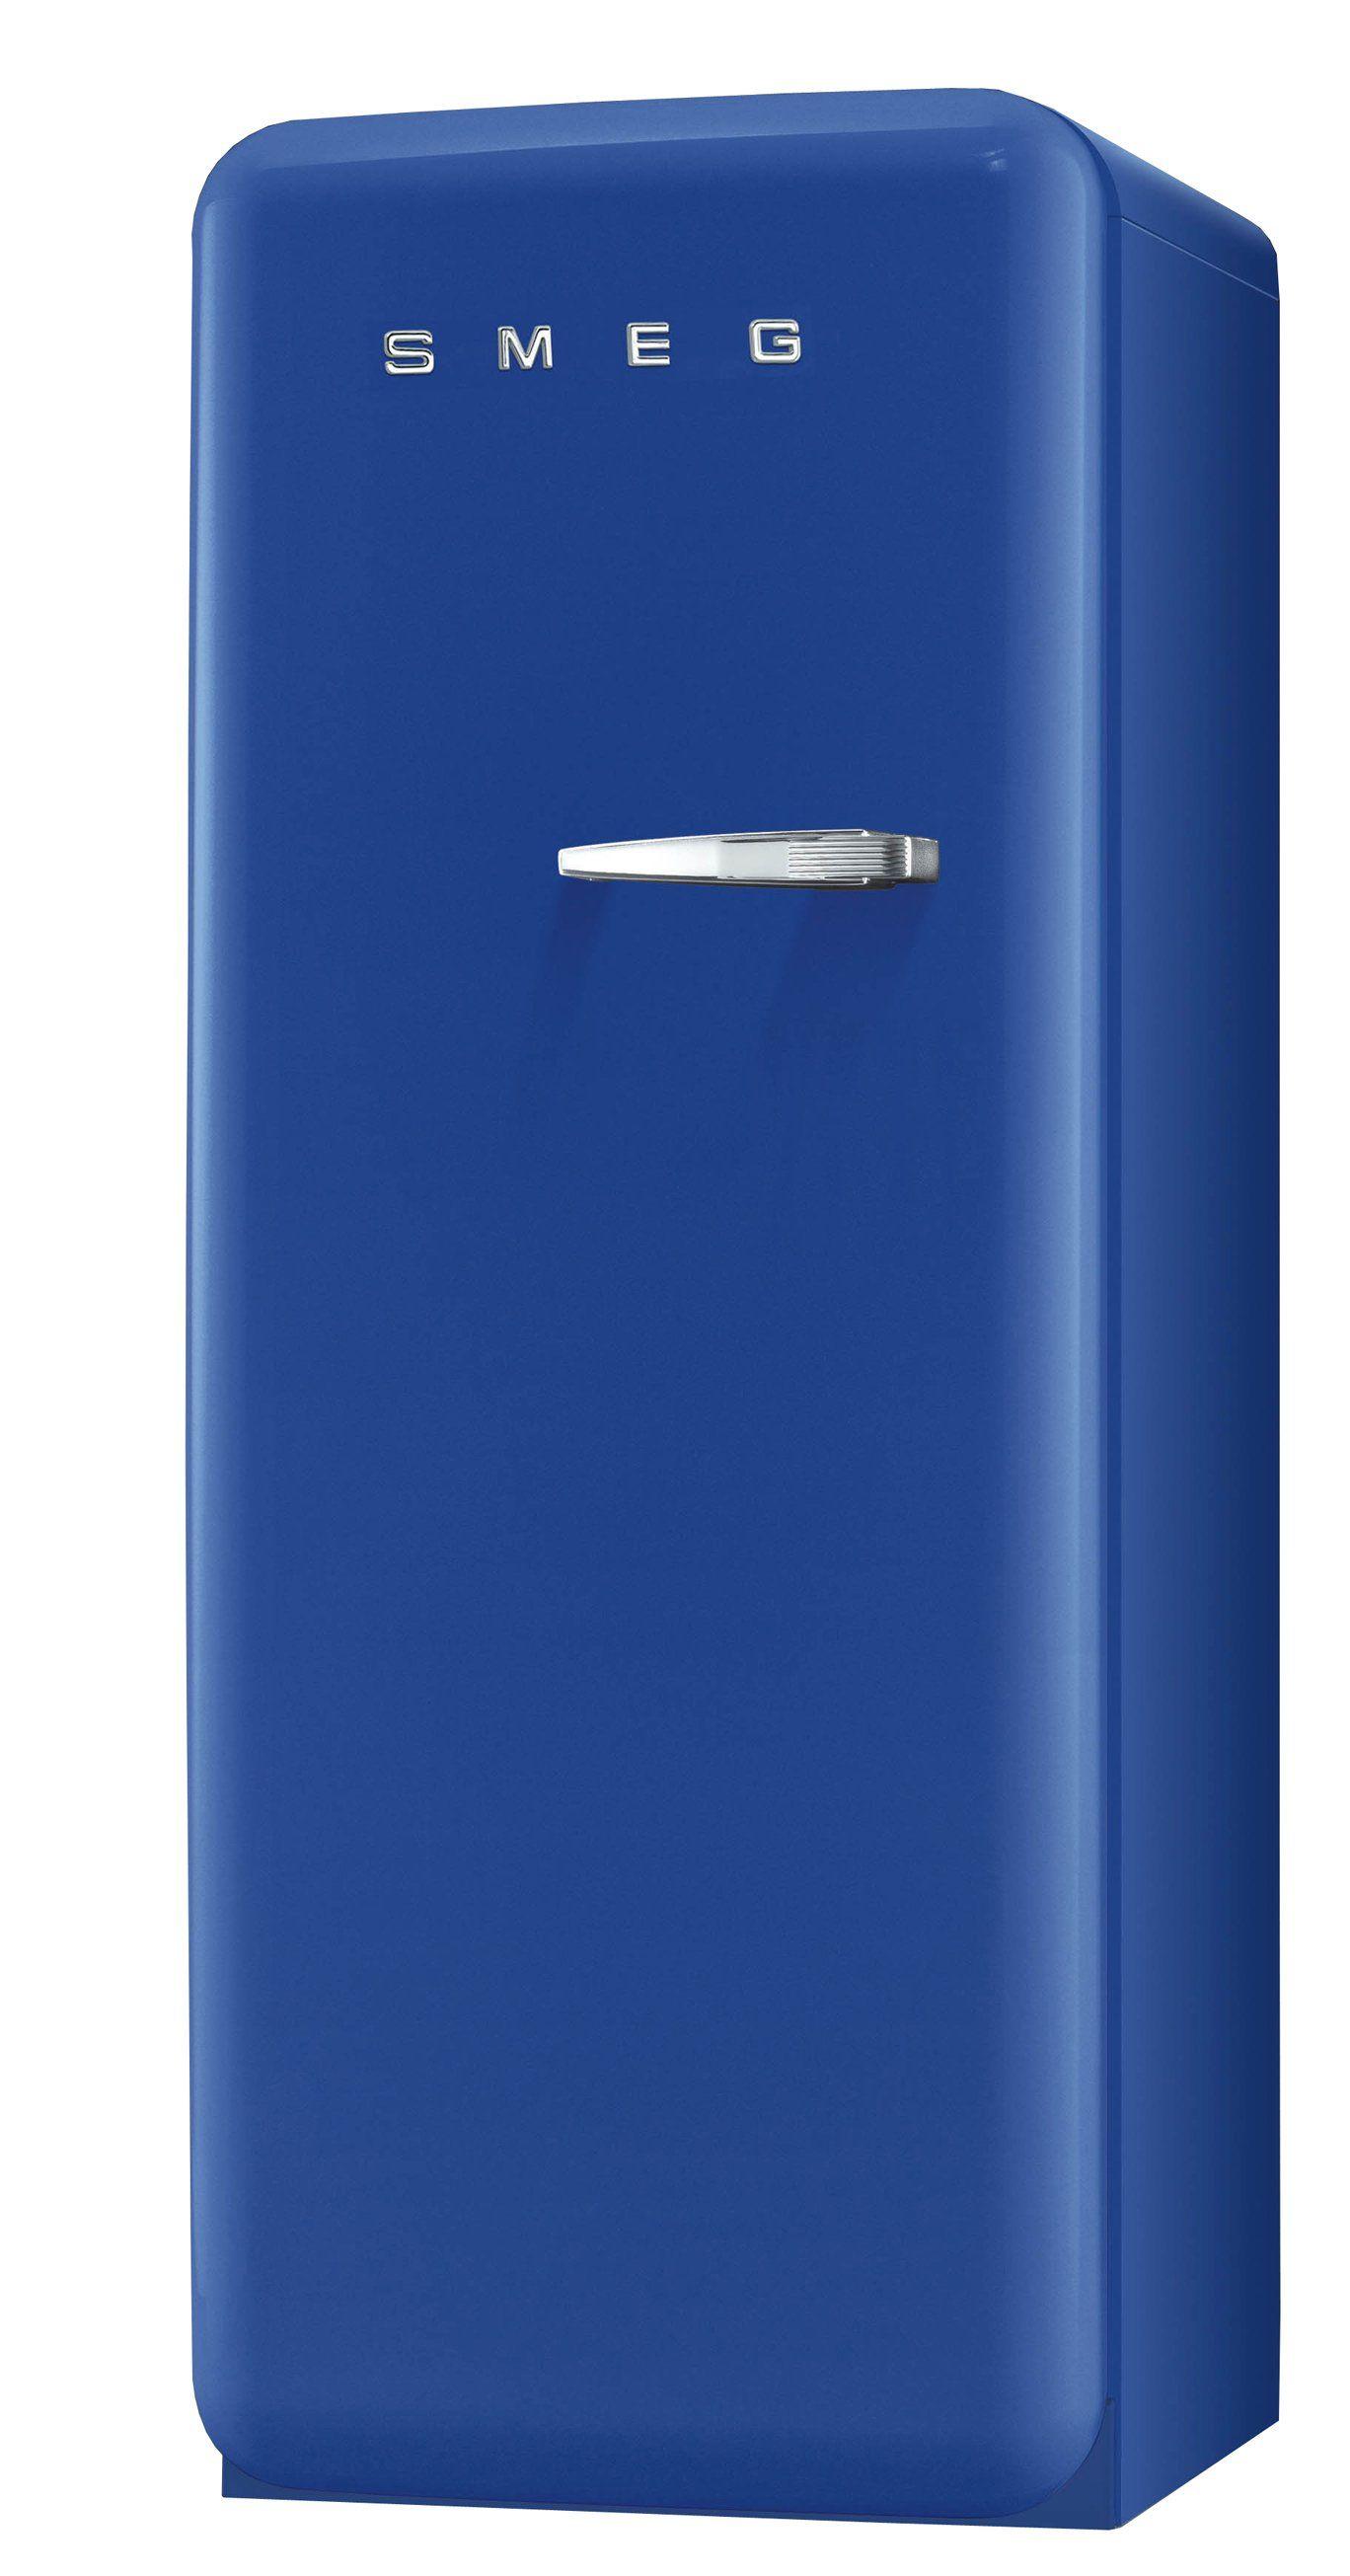 Réfrigérateur 1 Porte SMEG FAB28LBL1 Bleu Blue